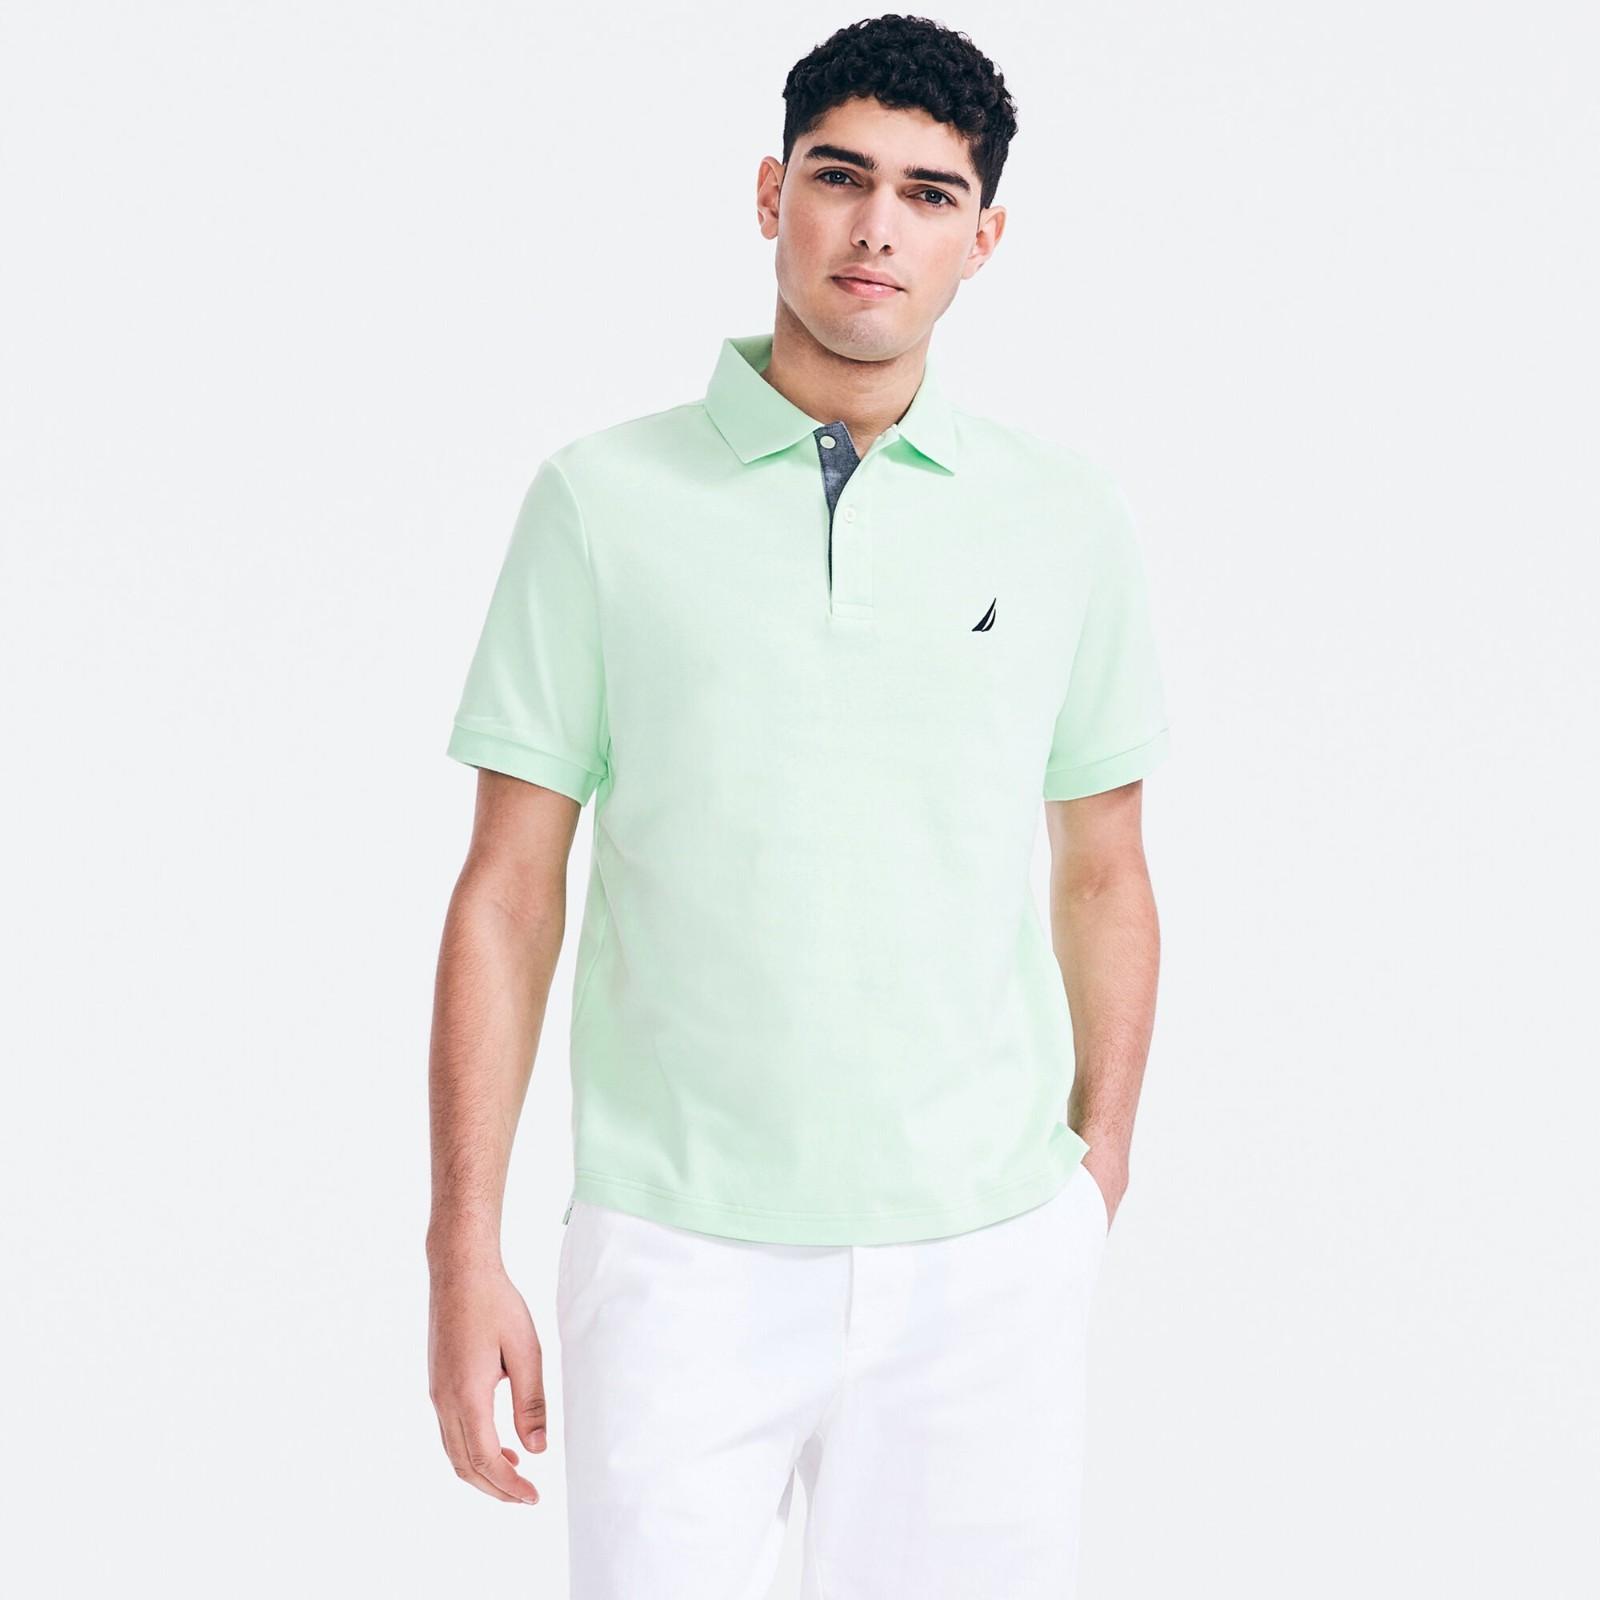 polo衫 薄荷绿